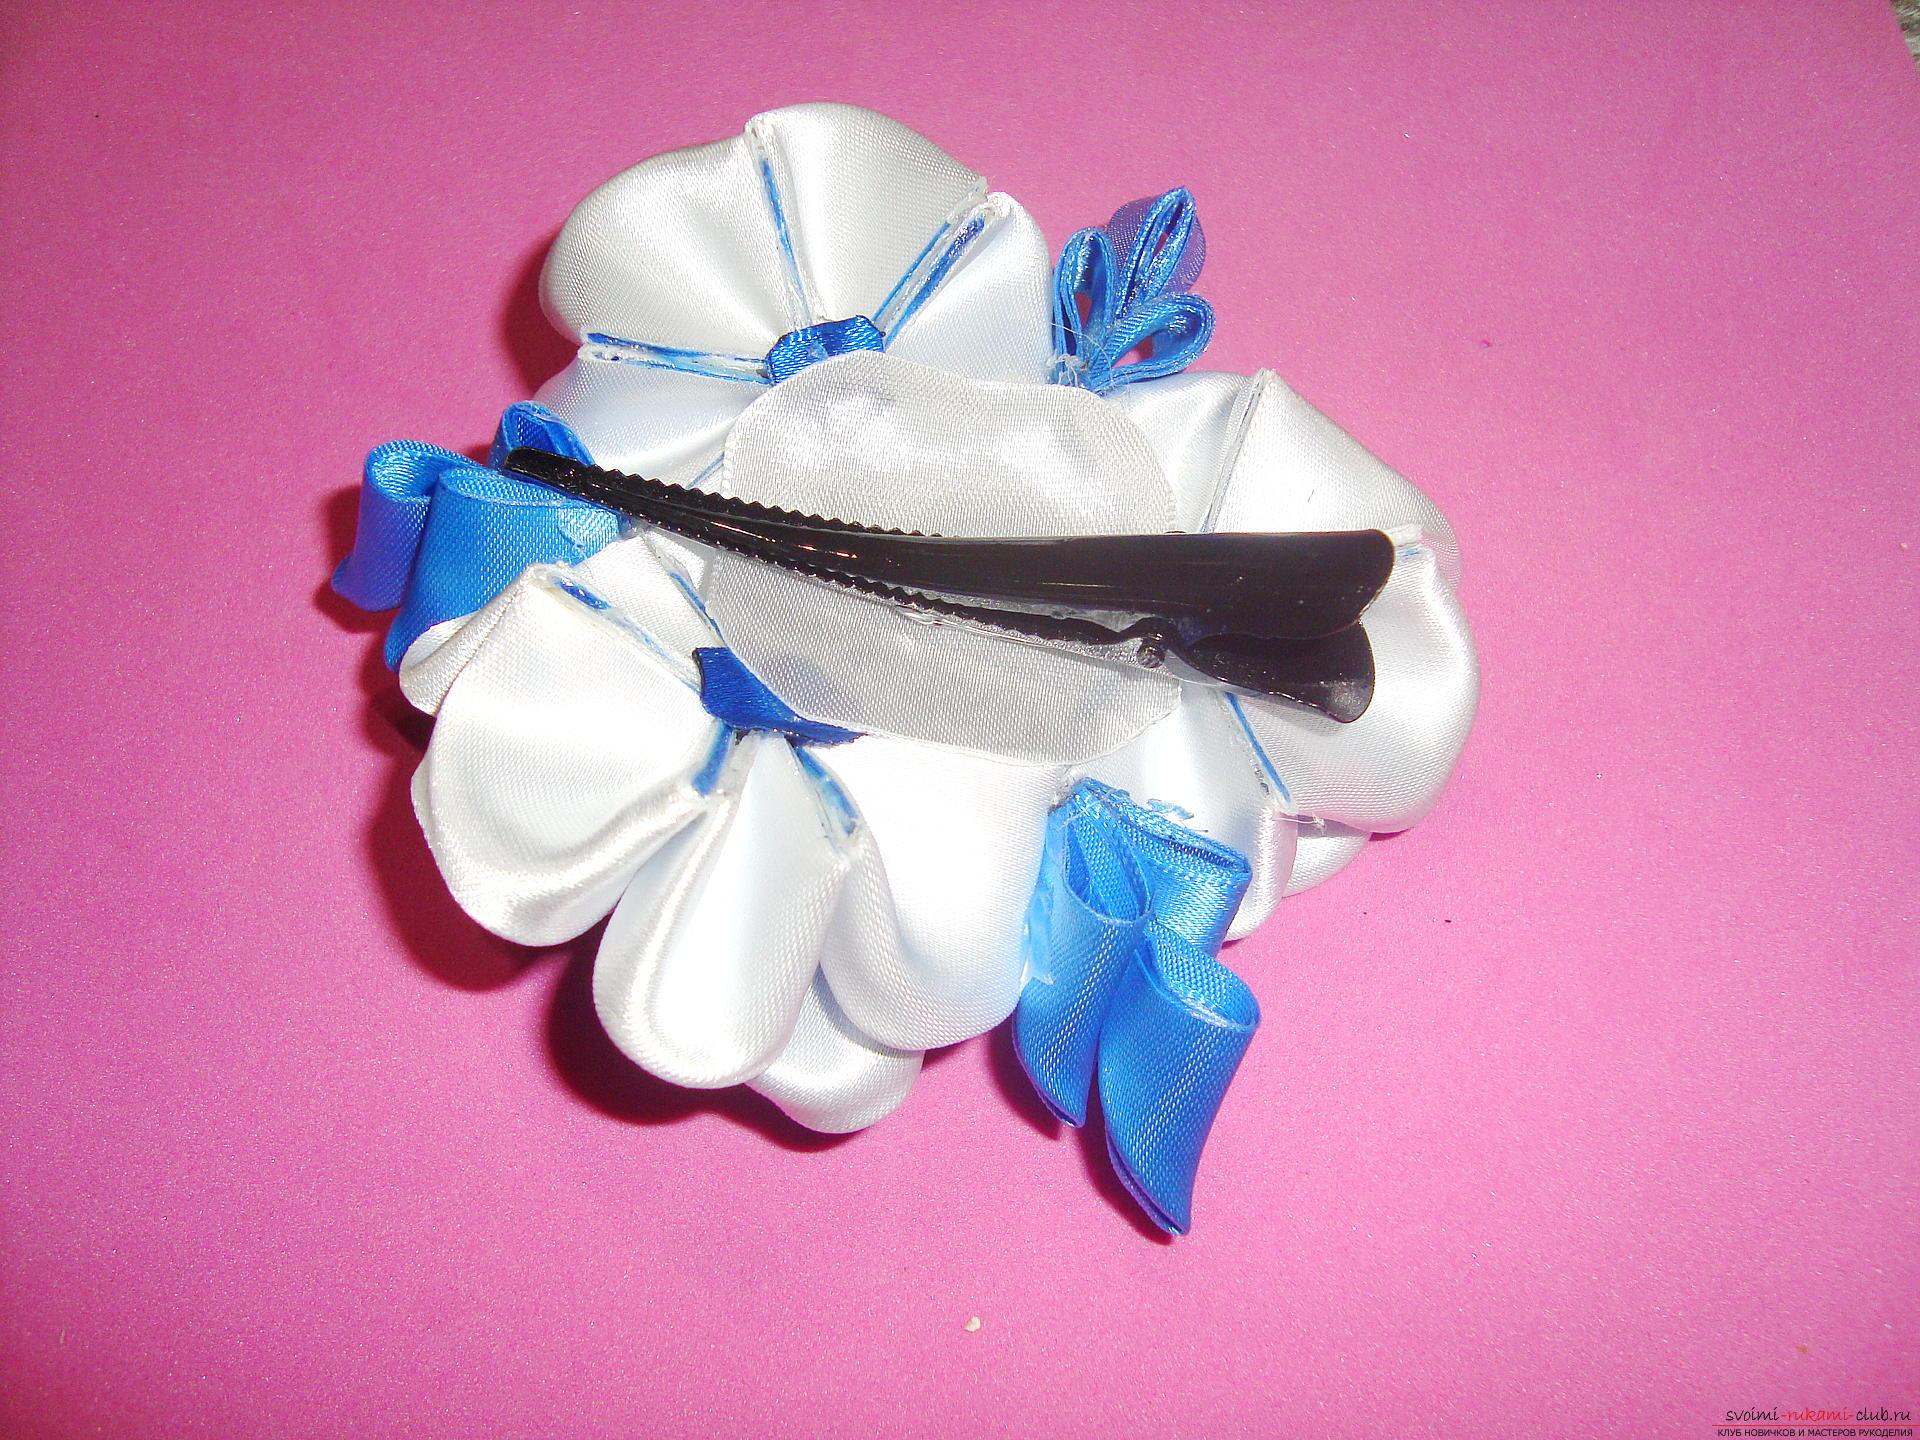 Фото инструкция по изготовлению заколки из лент голубого цвета в технике канзаши. Фото №15